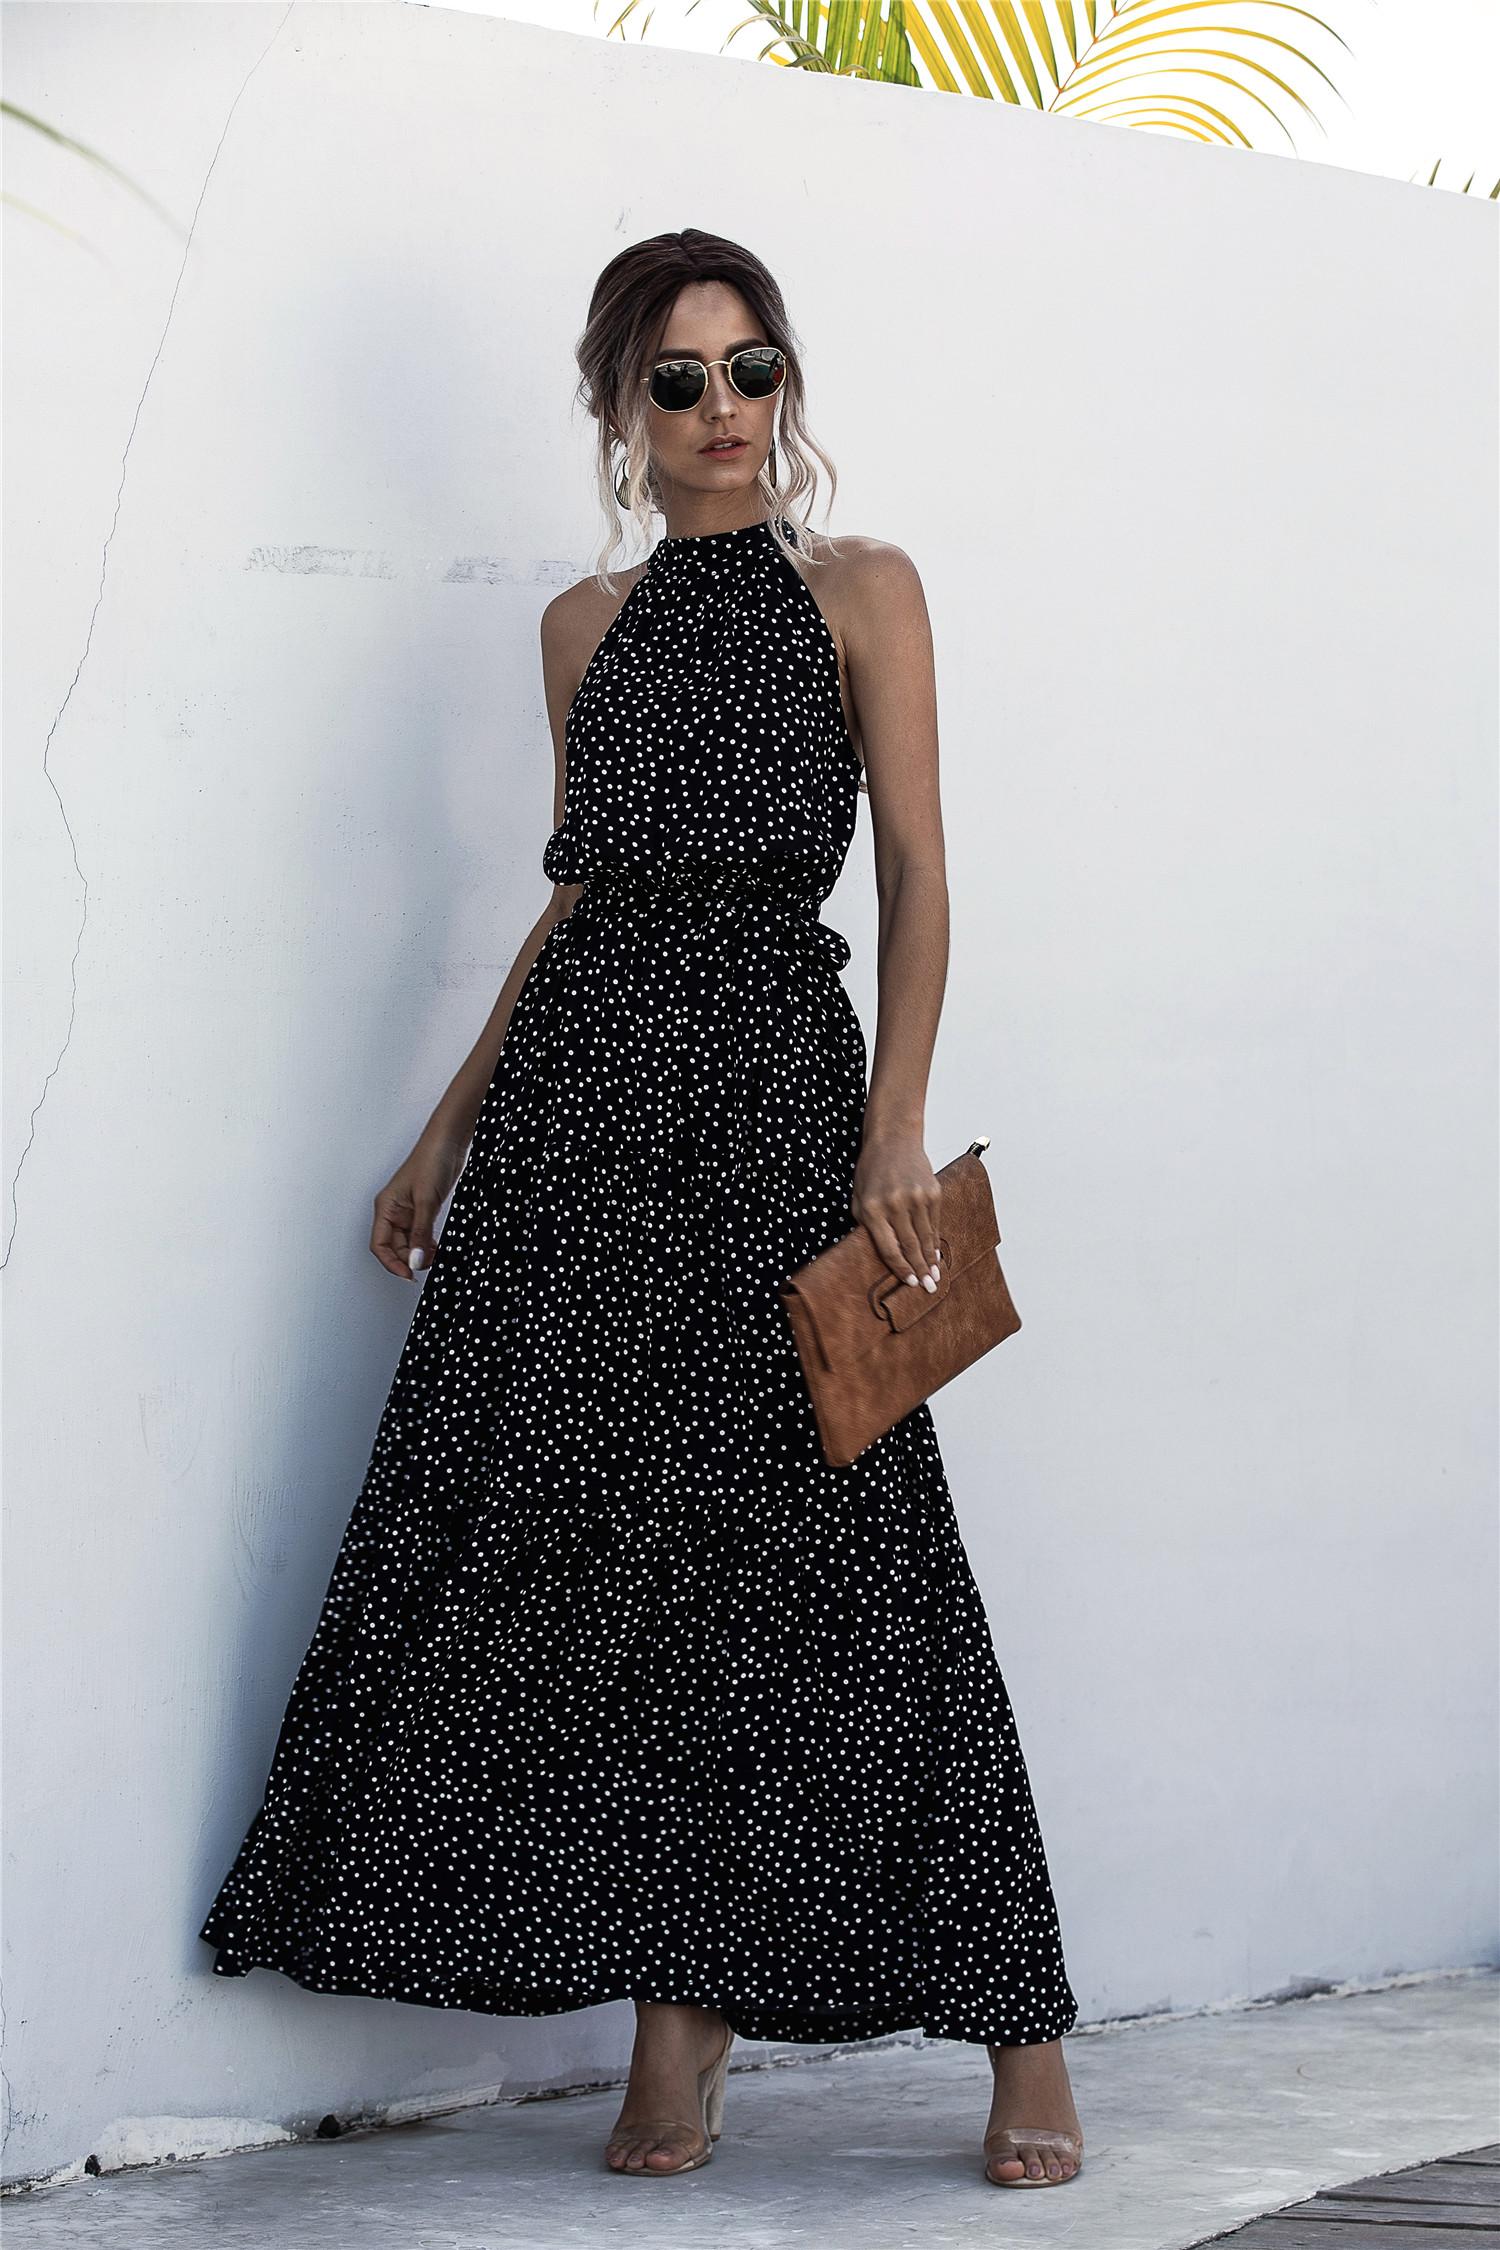 2020 Summer Long Dress Polka Dot Casual Midi Dresses Black Halter Strapless Yellow Sundress Vacation Dress Clothes For Women